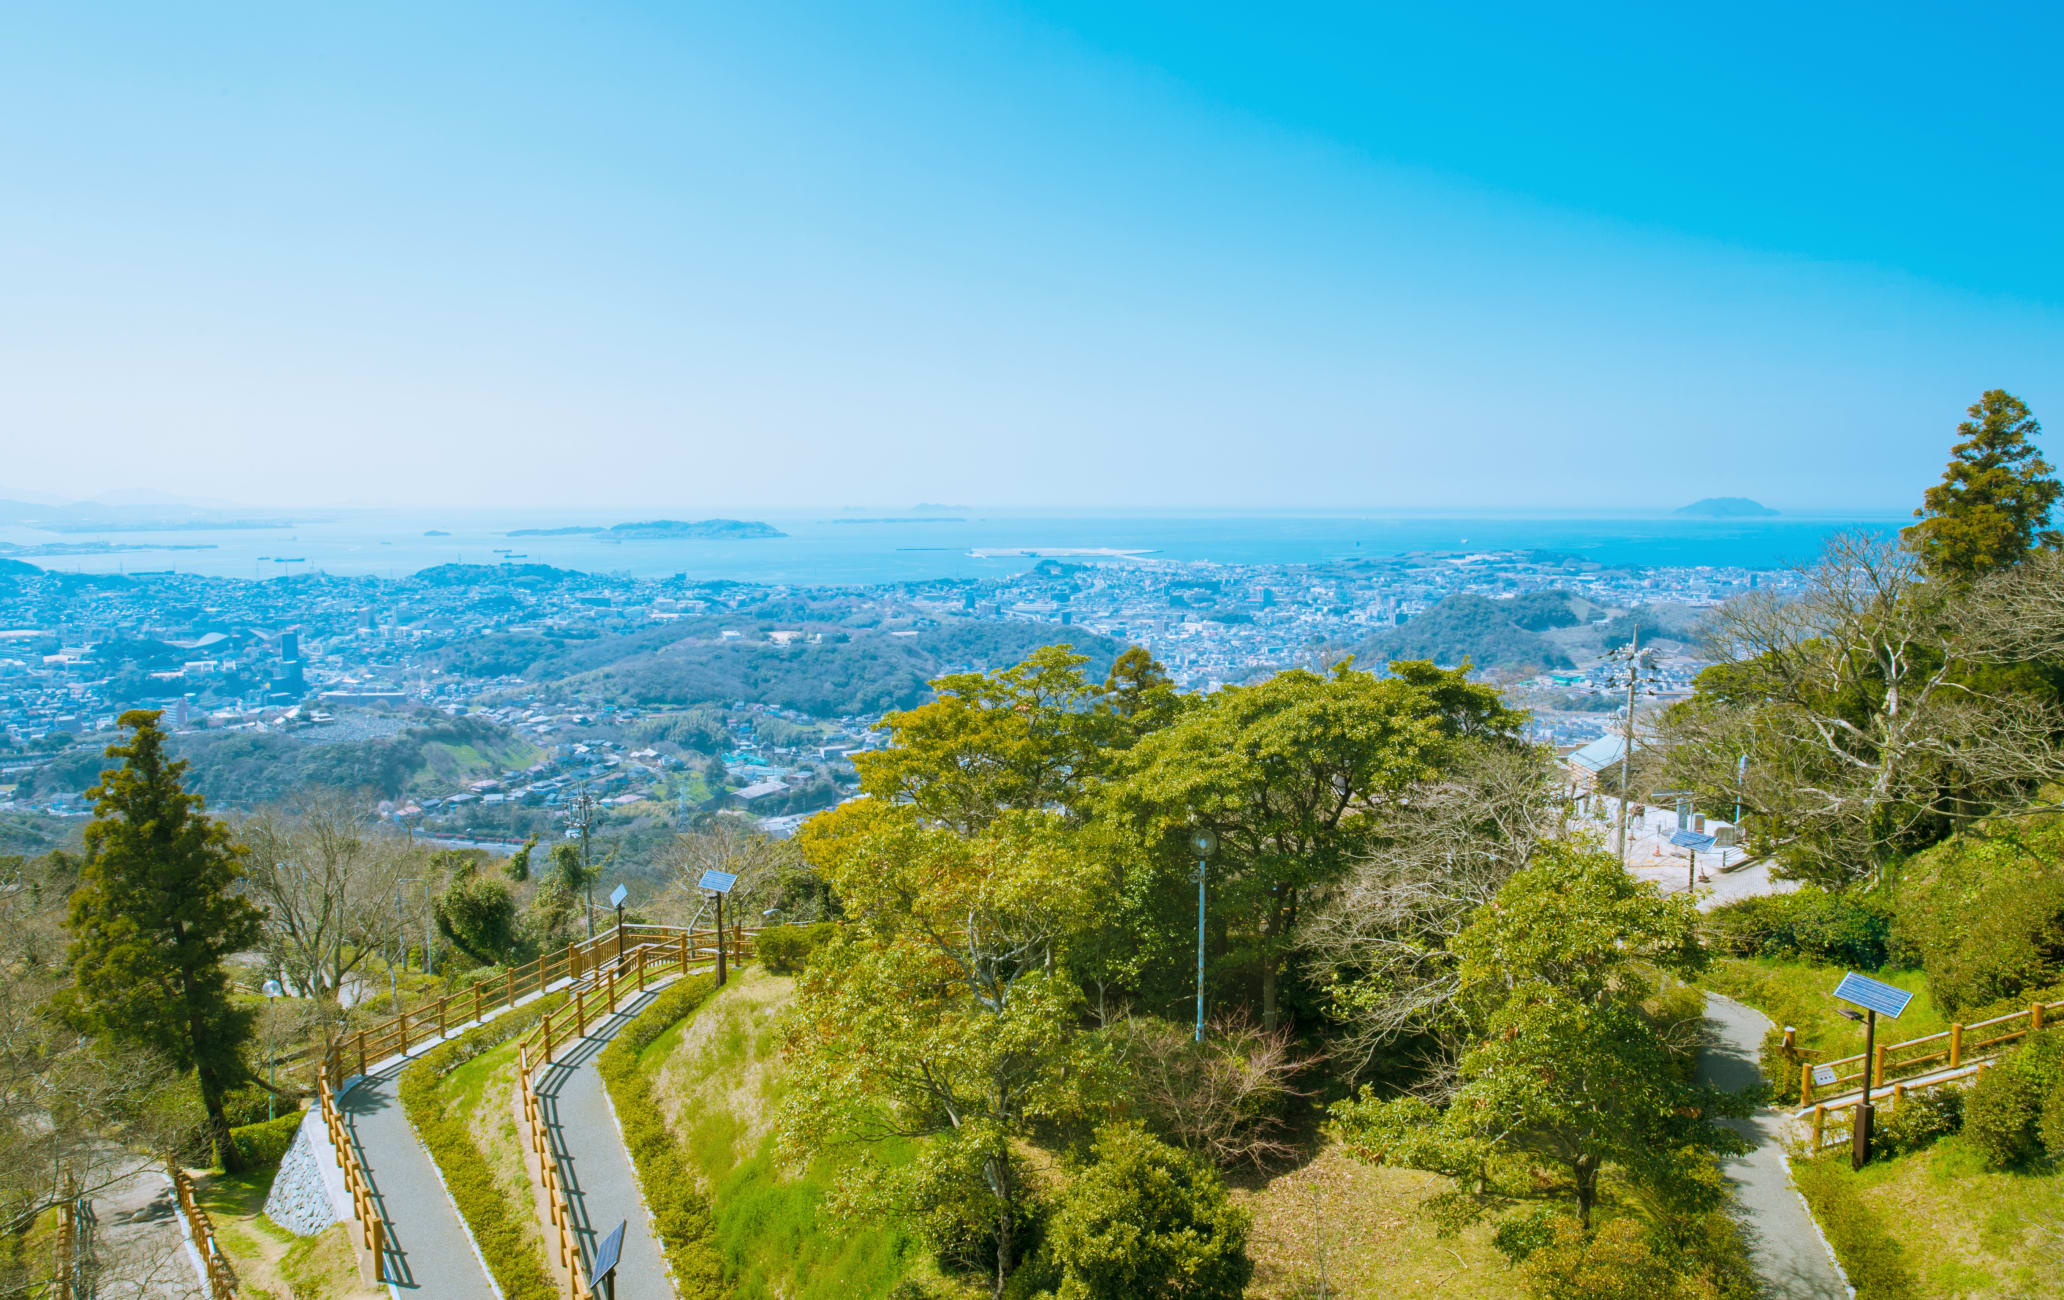 Hinoyama Park